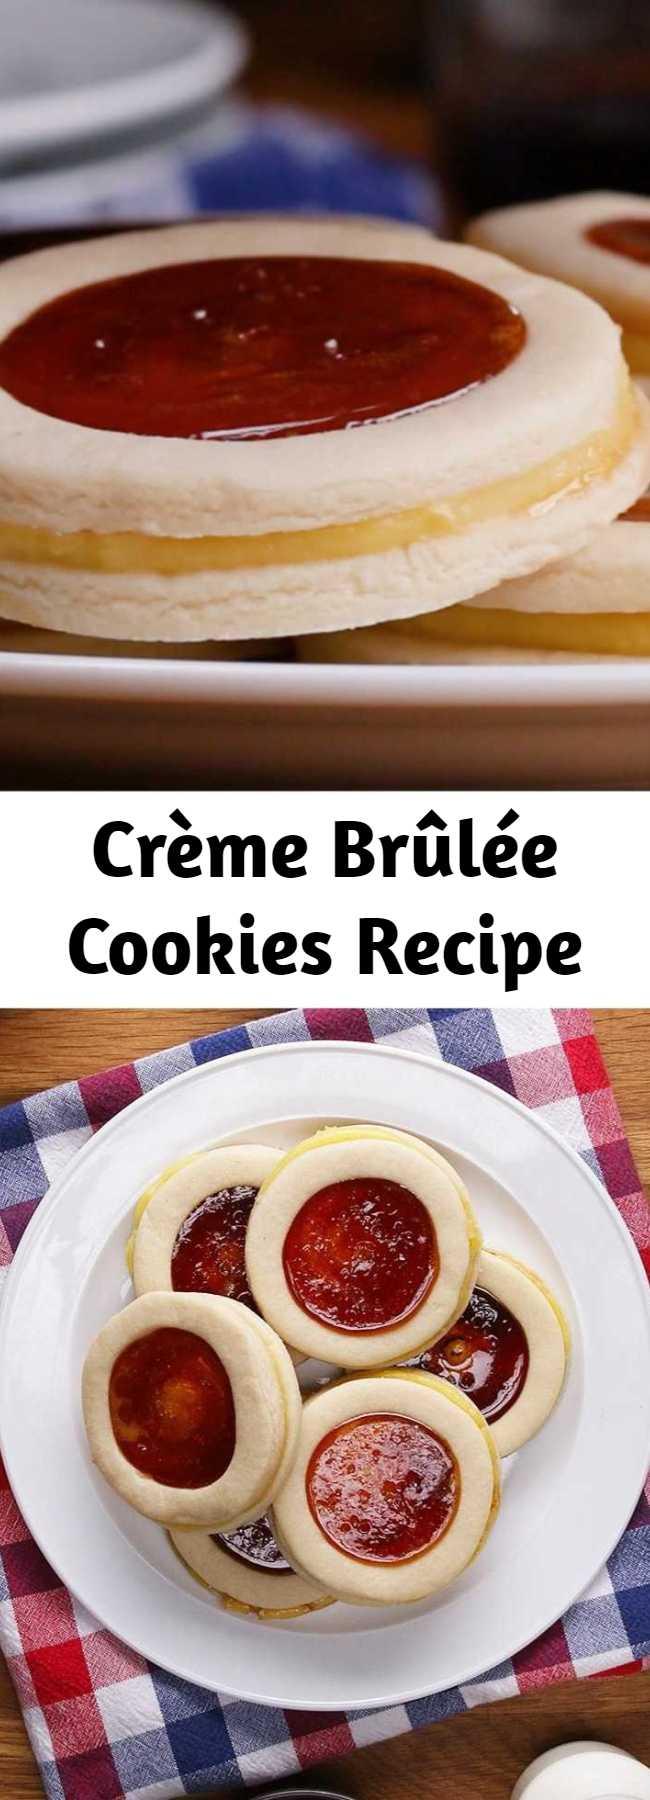 Crème Brûlée Cookies Recipe - Caramelized sugar is our new favorite frosting sub.